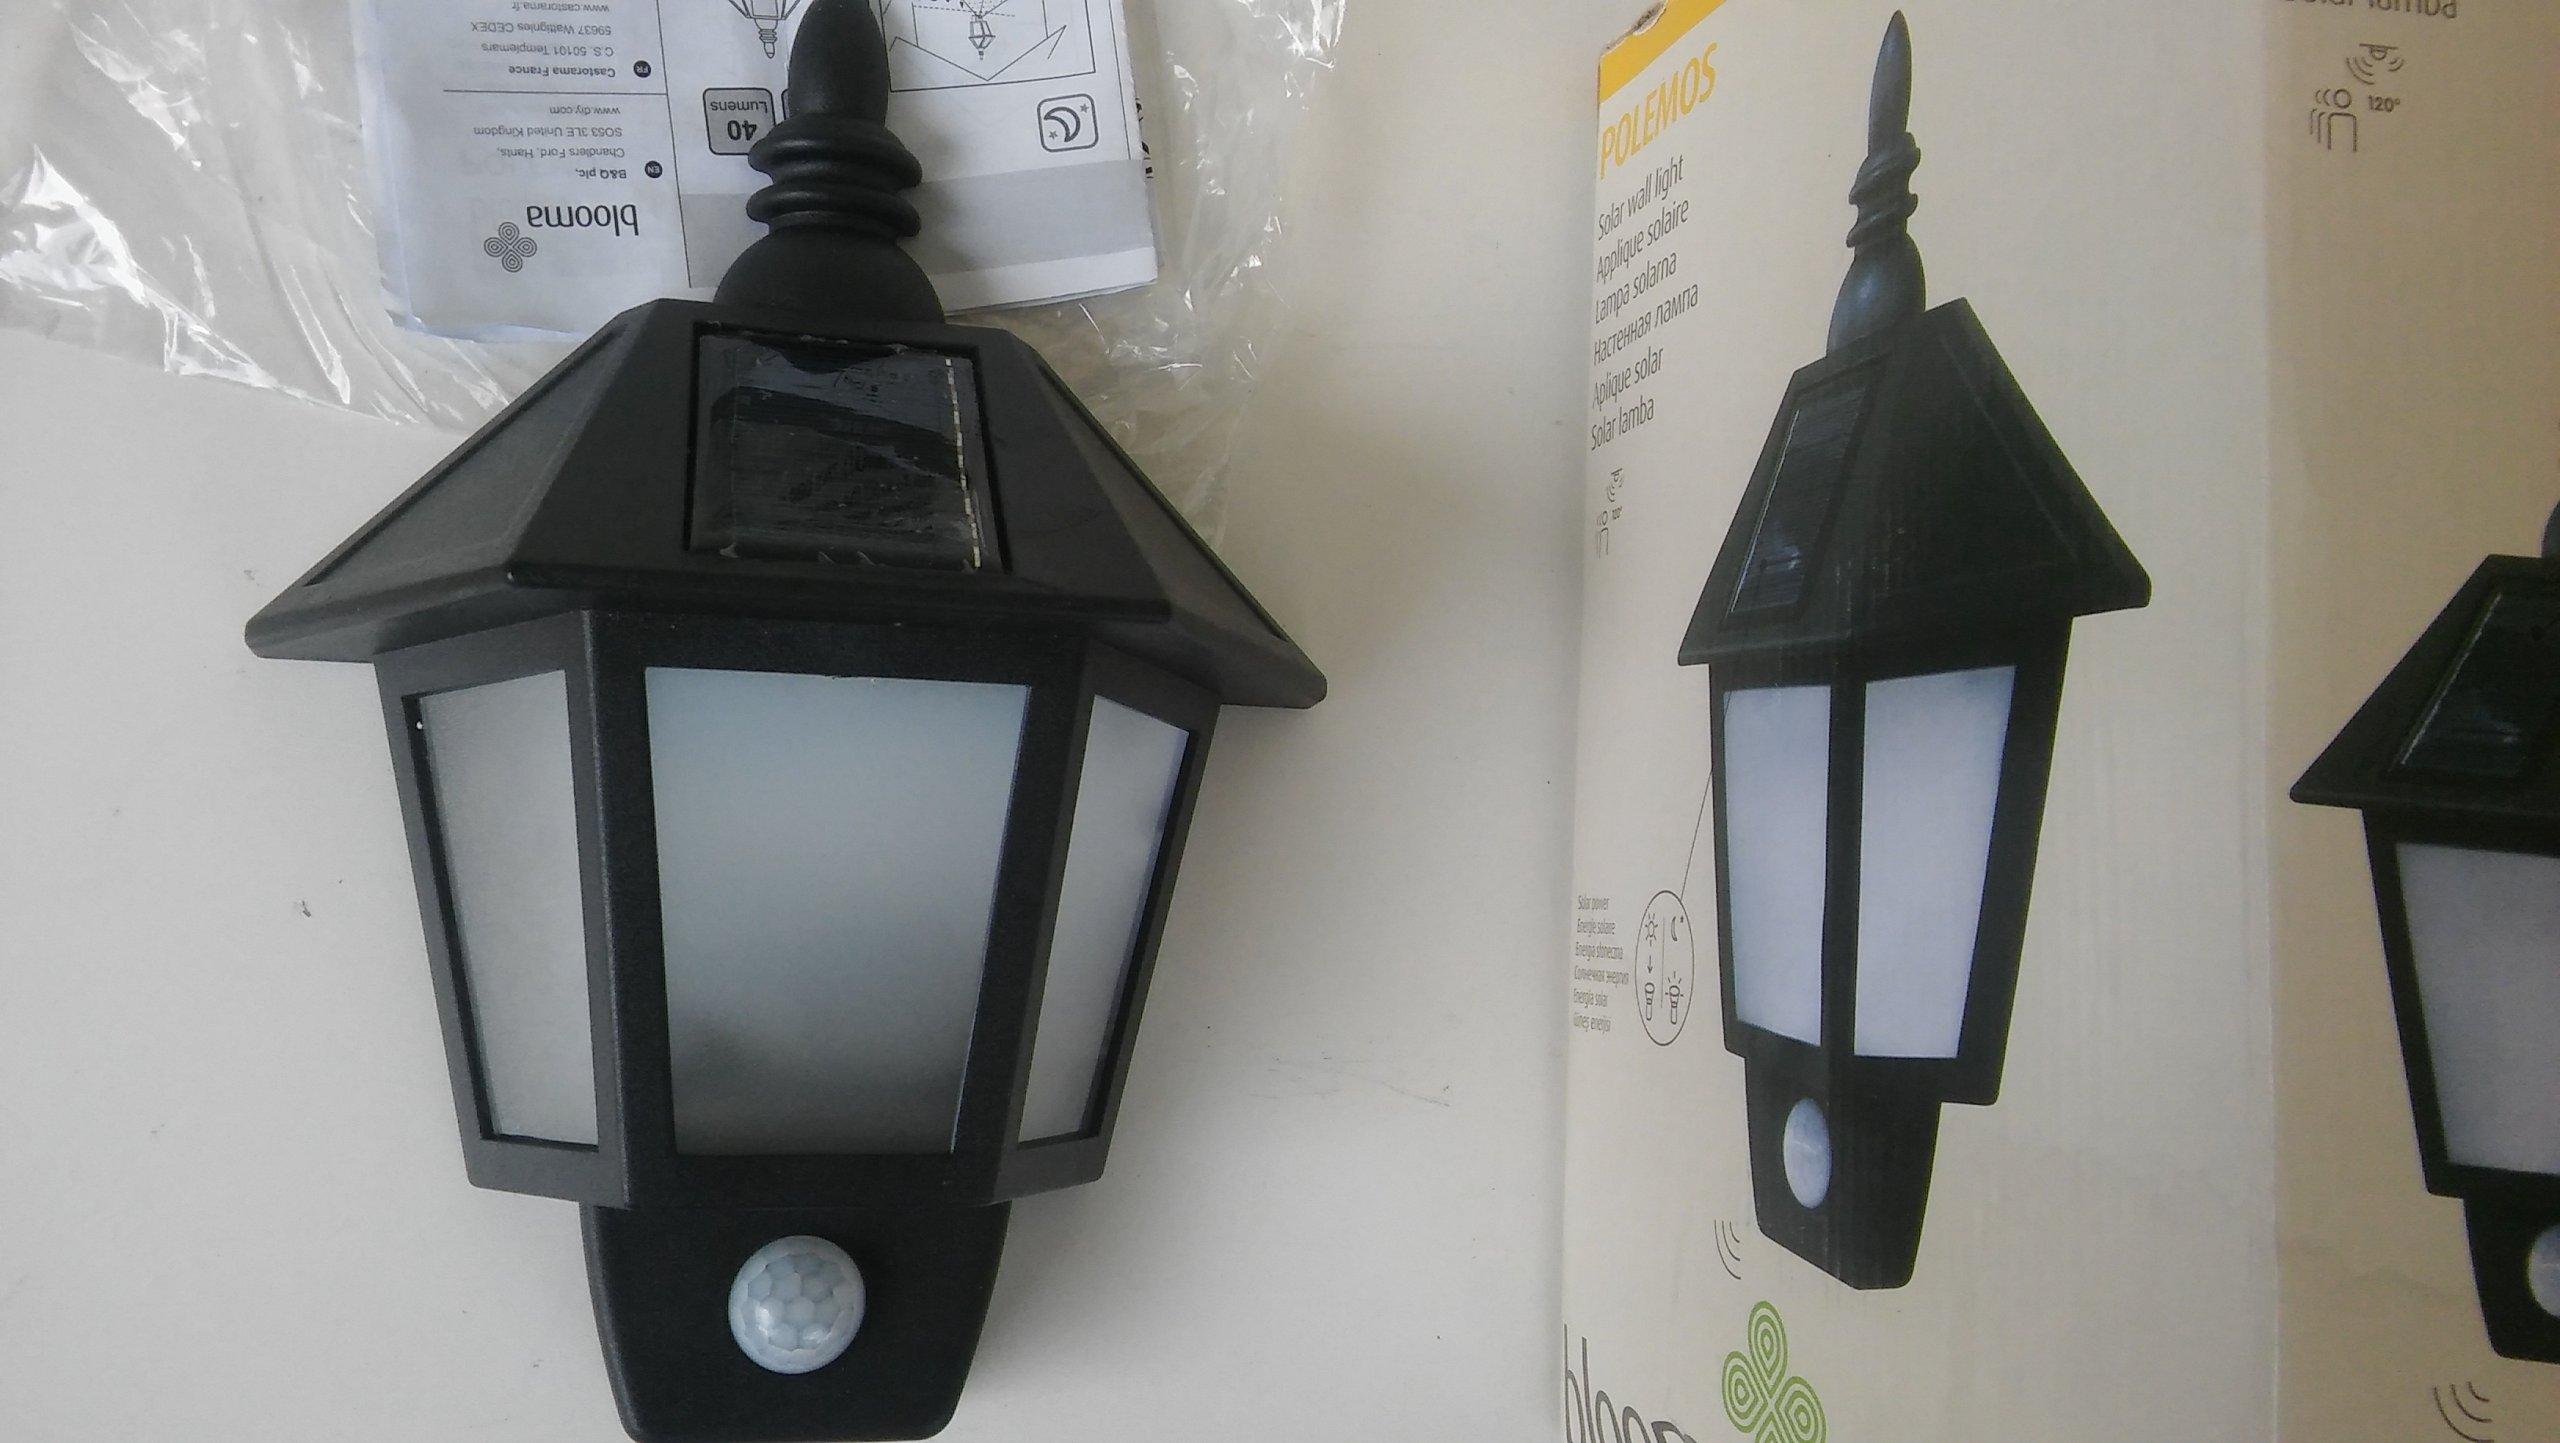 Lampa Solarna Blooma Uq86 Getclopa